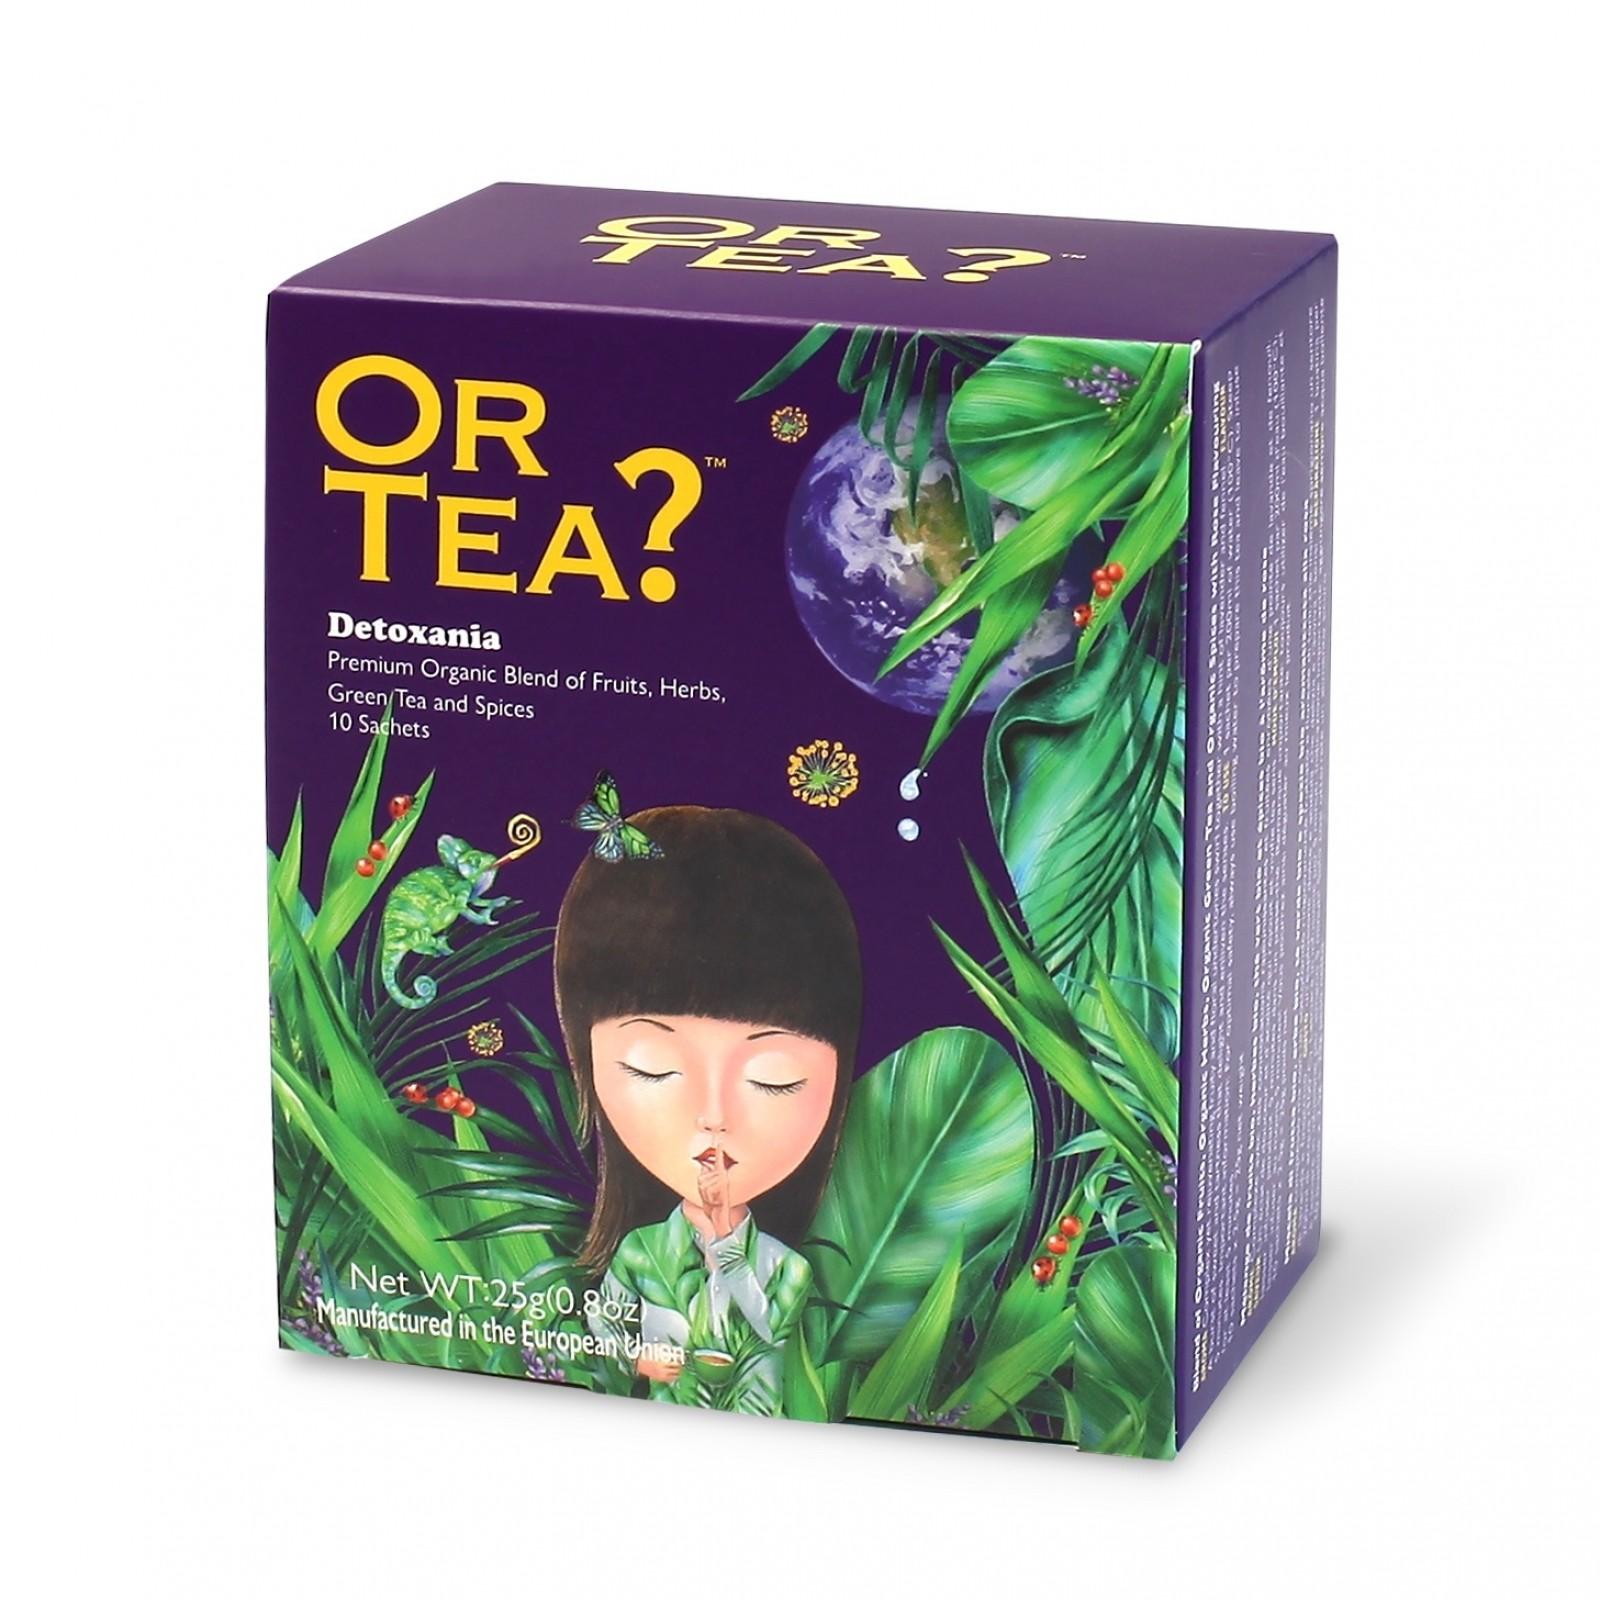 Detoxania - Groene thee met kruiden en fruit